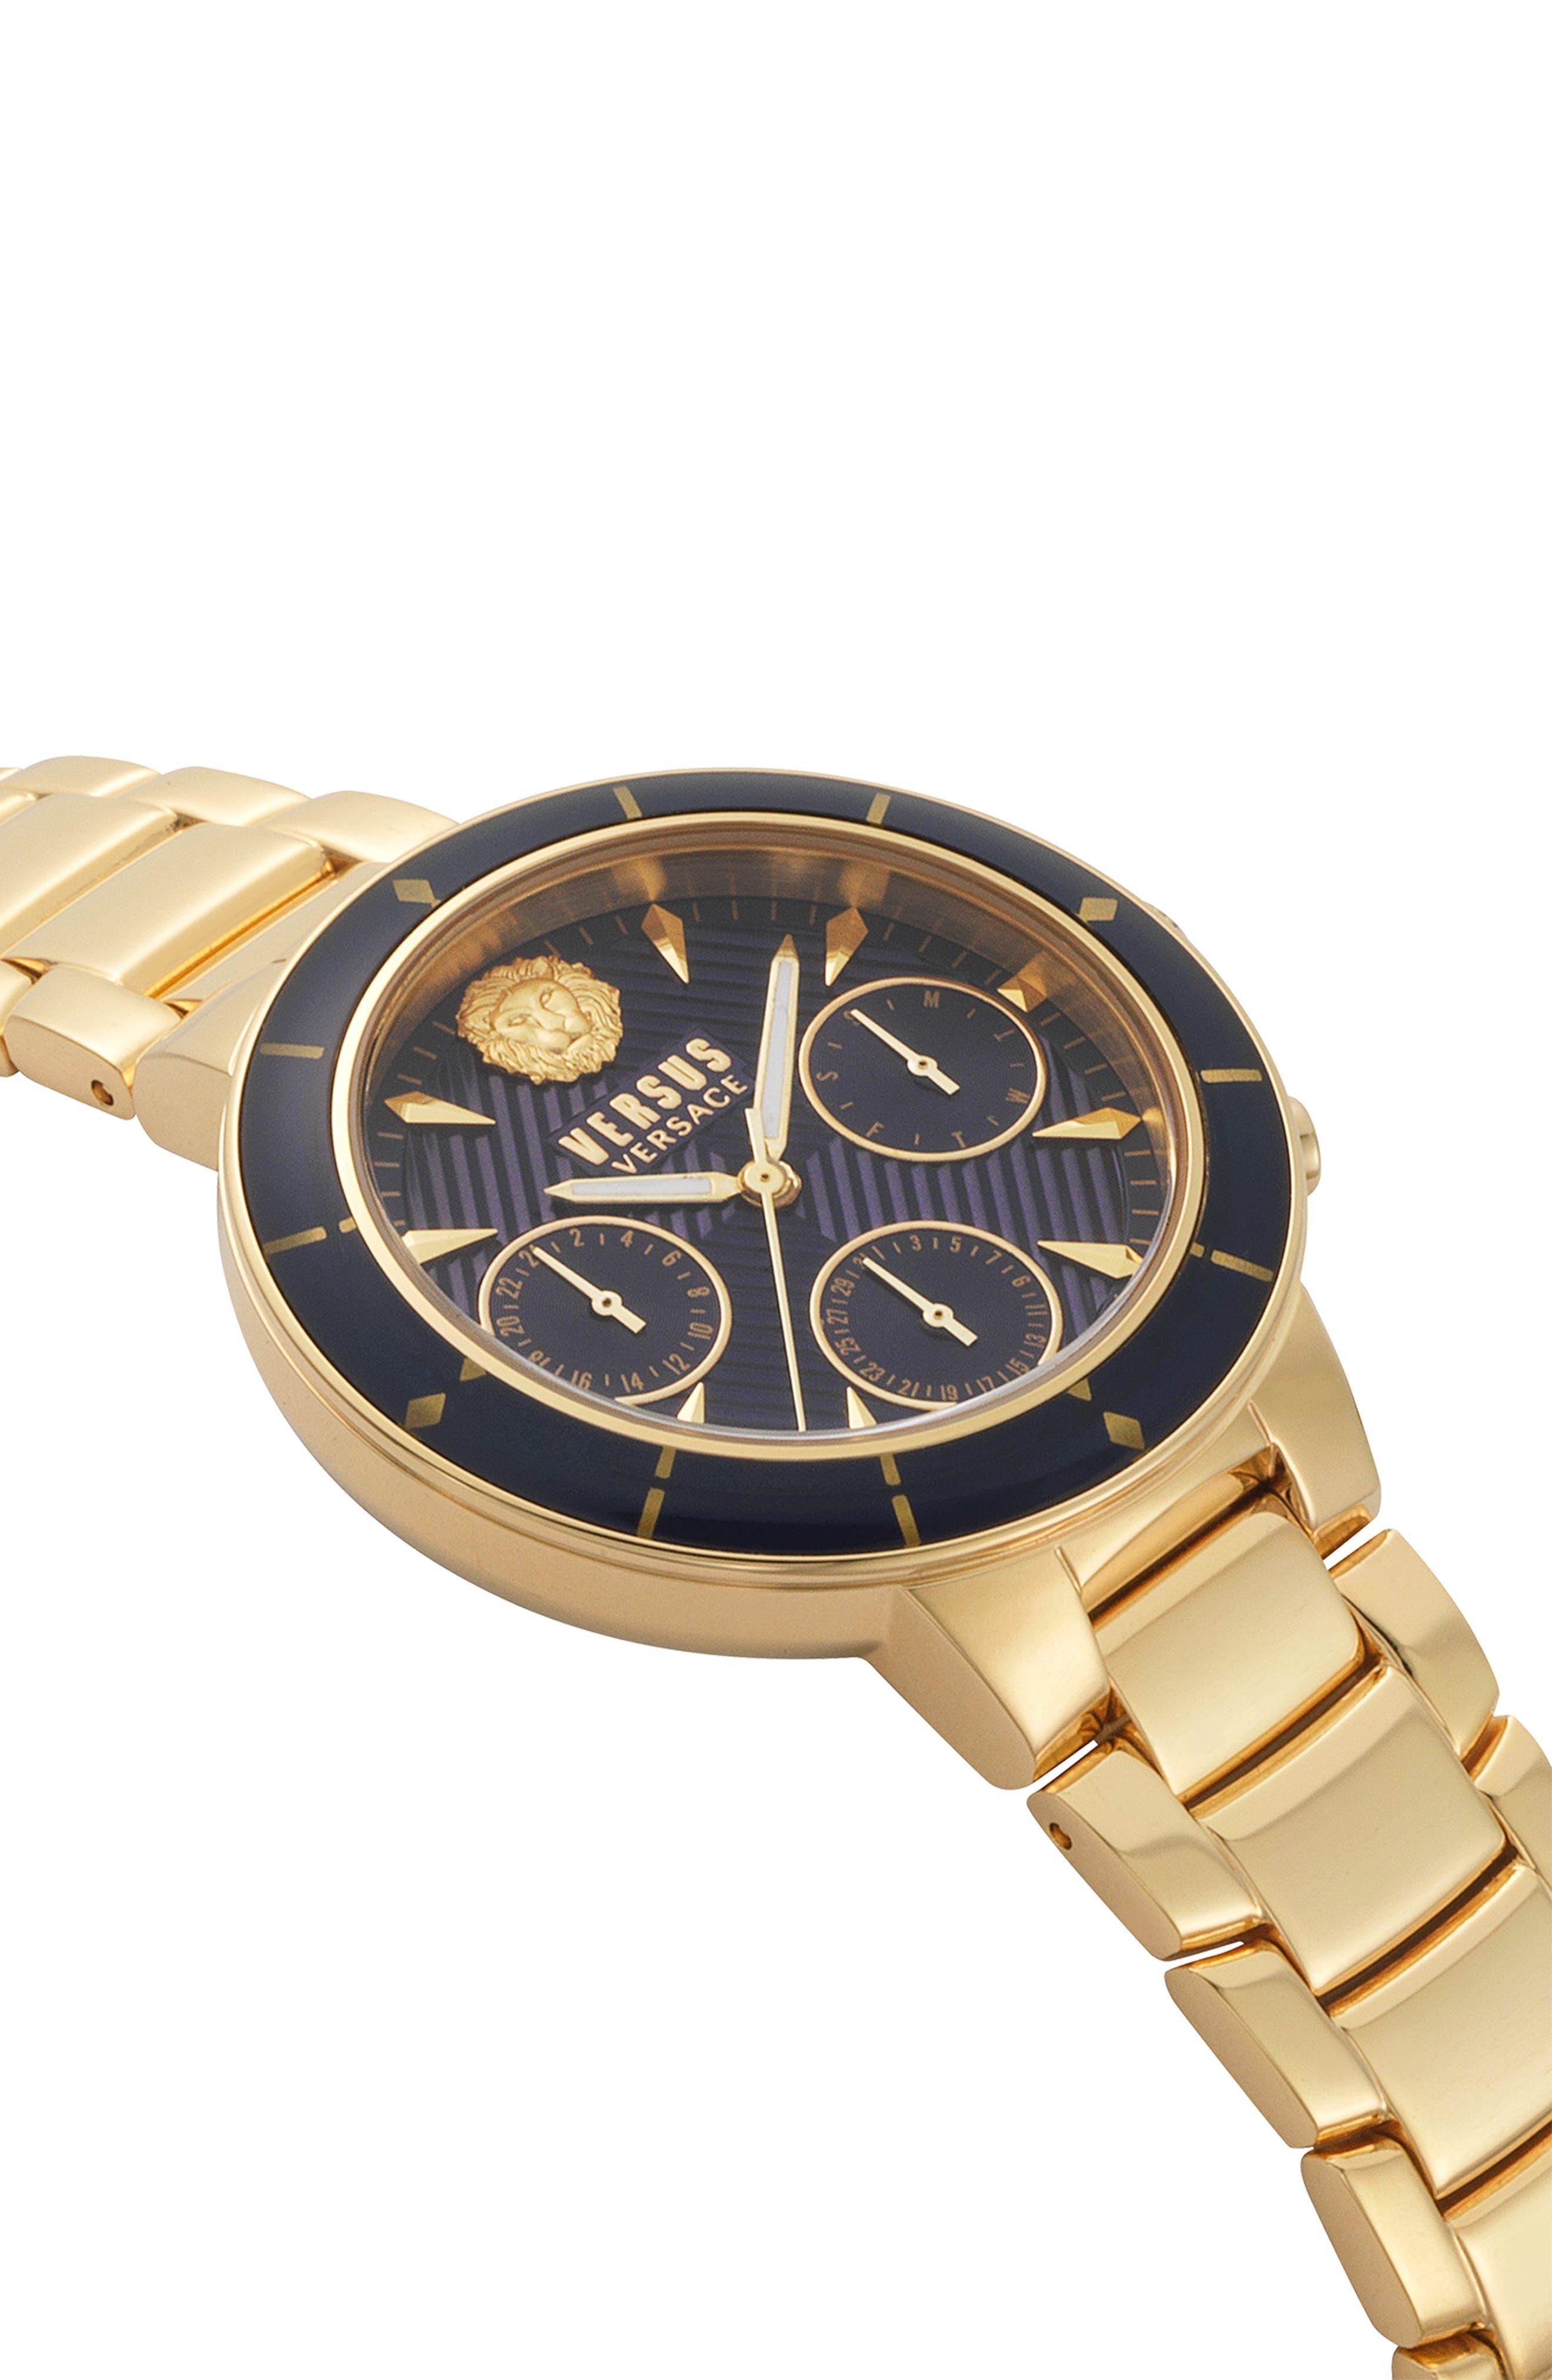 VERSUS VERSACE, Harbour Heights Chronograph Bracelet Watch, 38mm, Alternate thumbnail 3, color, GOLD/ BLUE